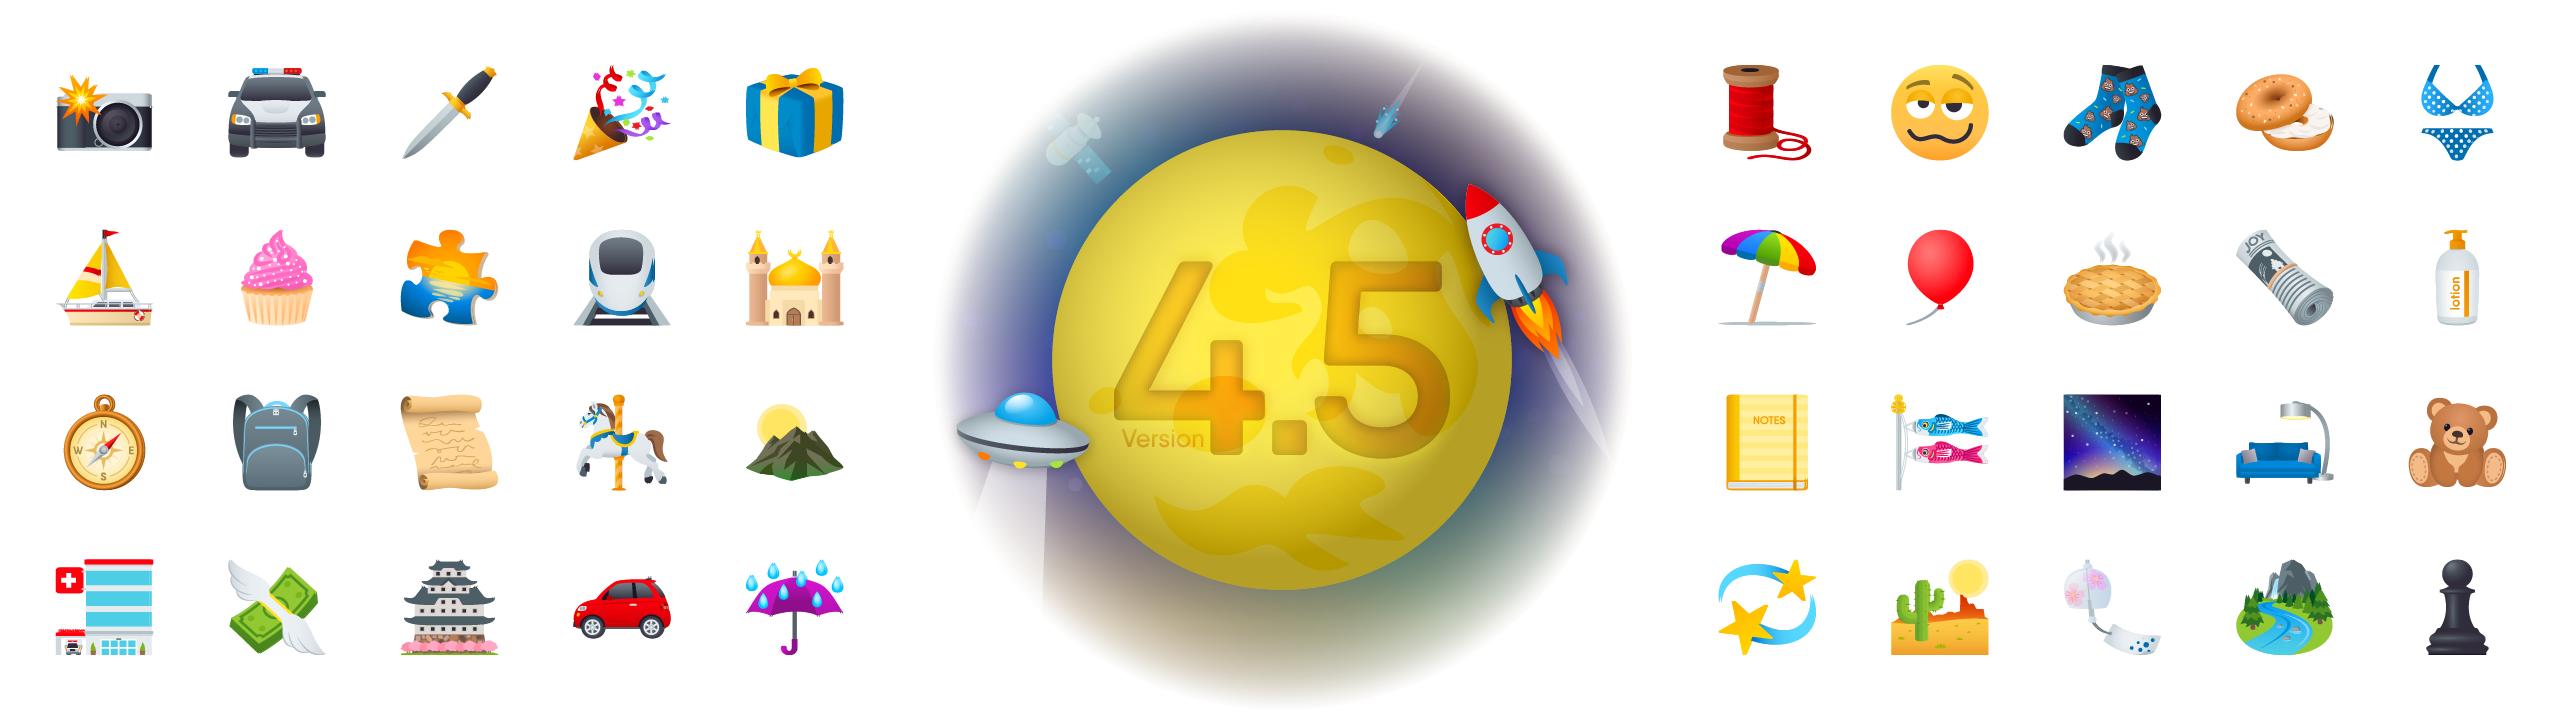 JoyPixels   2019 Emoji Set (version 4 5)